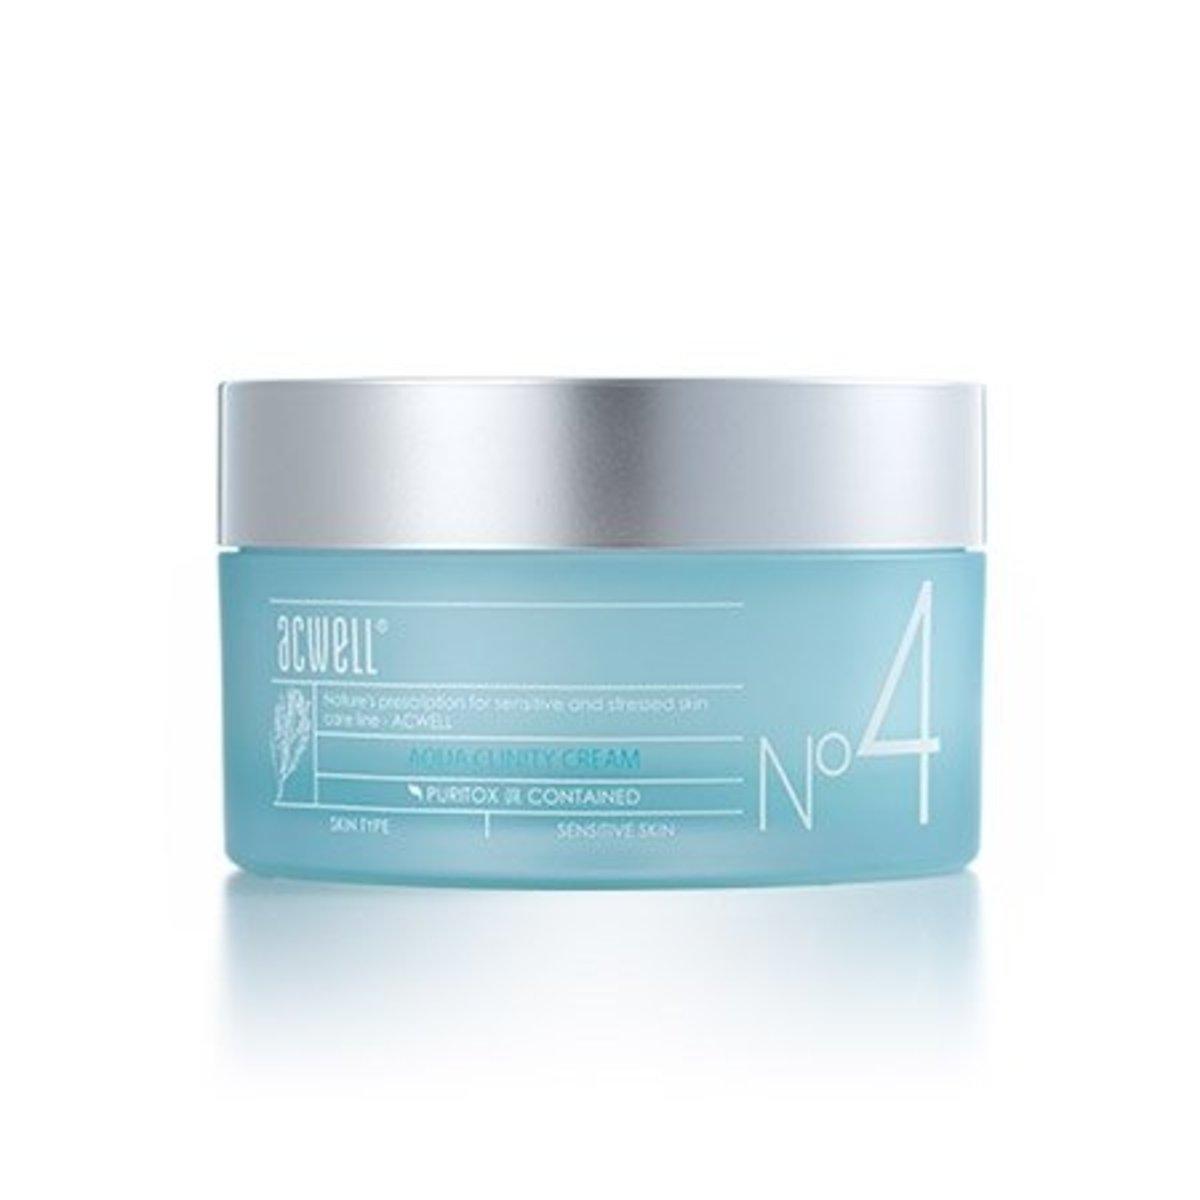 No4 Aqua Clinity Cream 50ml